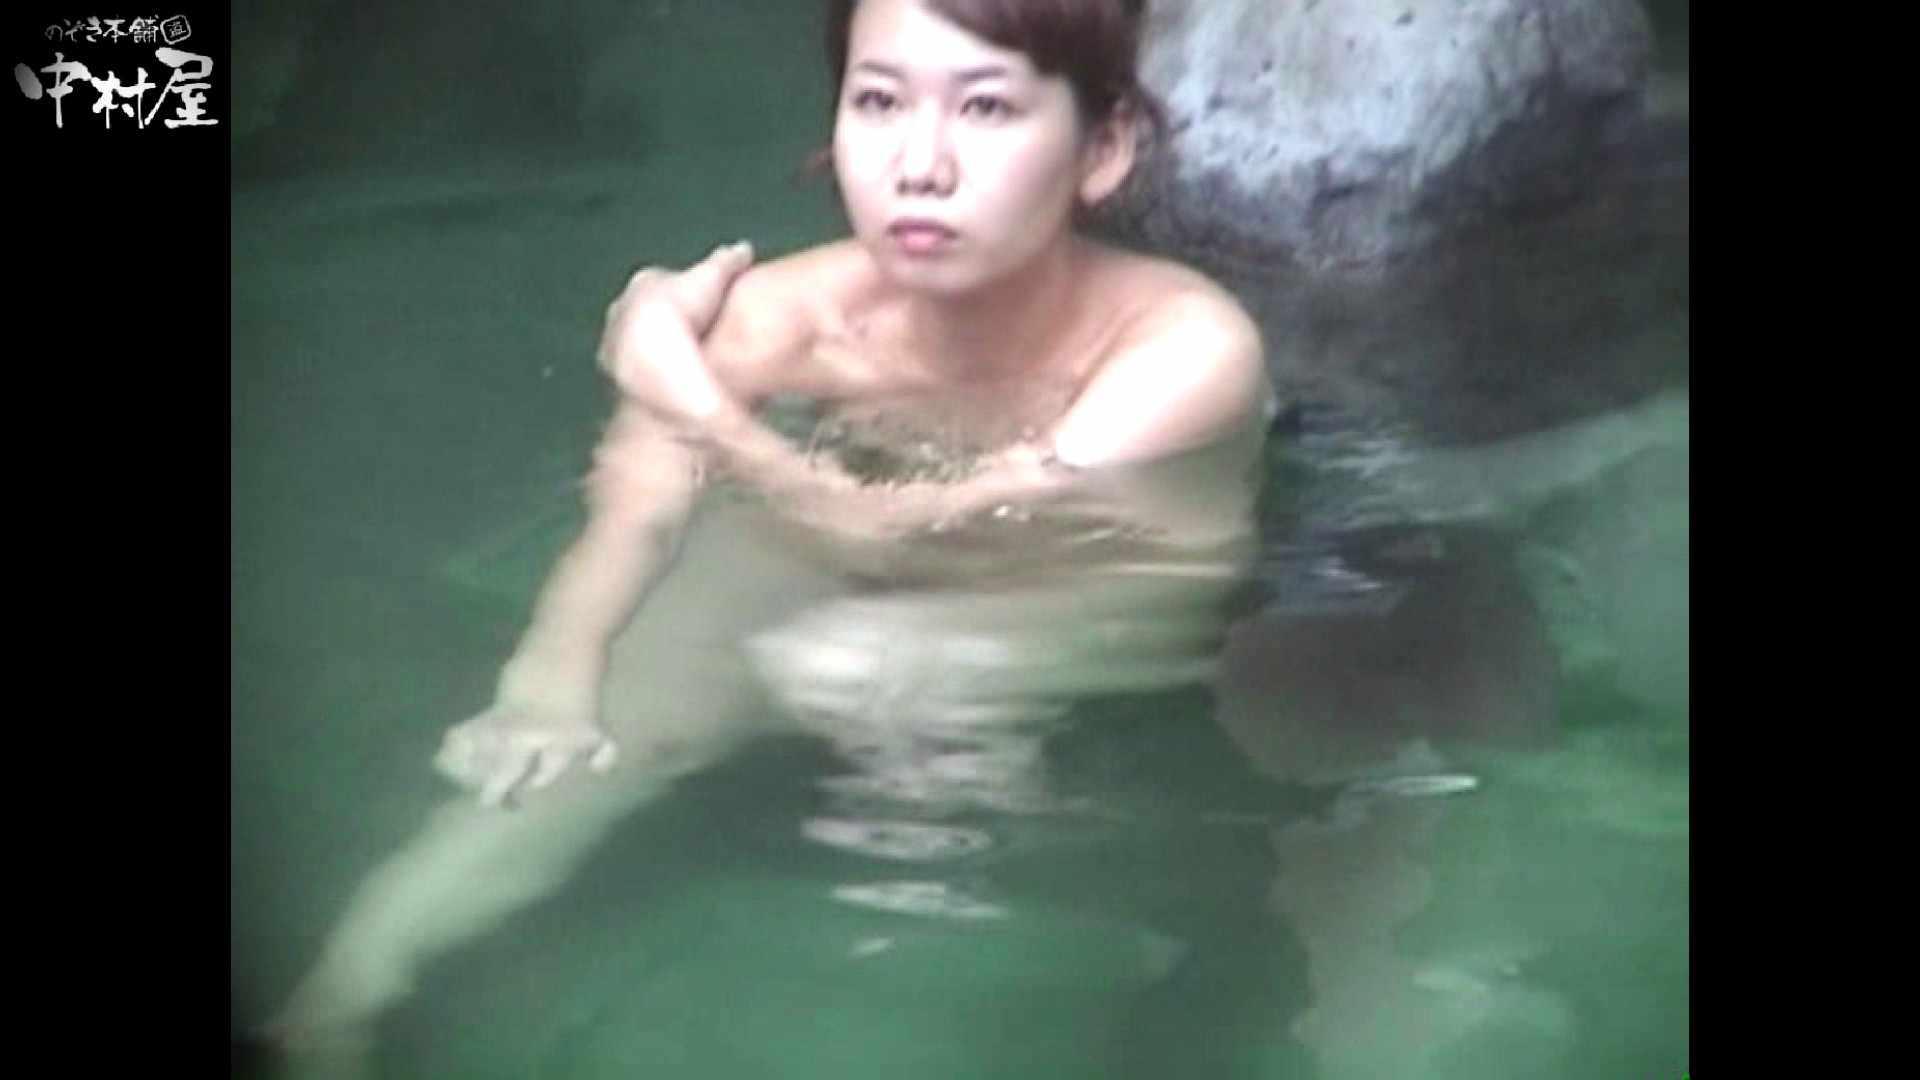 Aquaな露天風呂Vol.951 露天風呂 隠し撮りオマンコ動画紹介 80連発 2